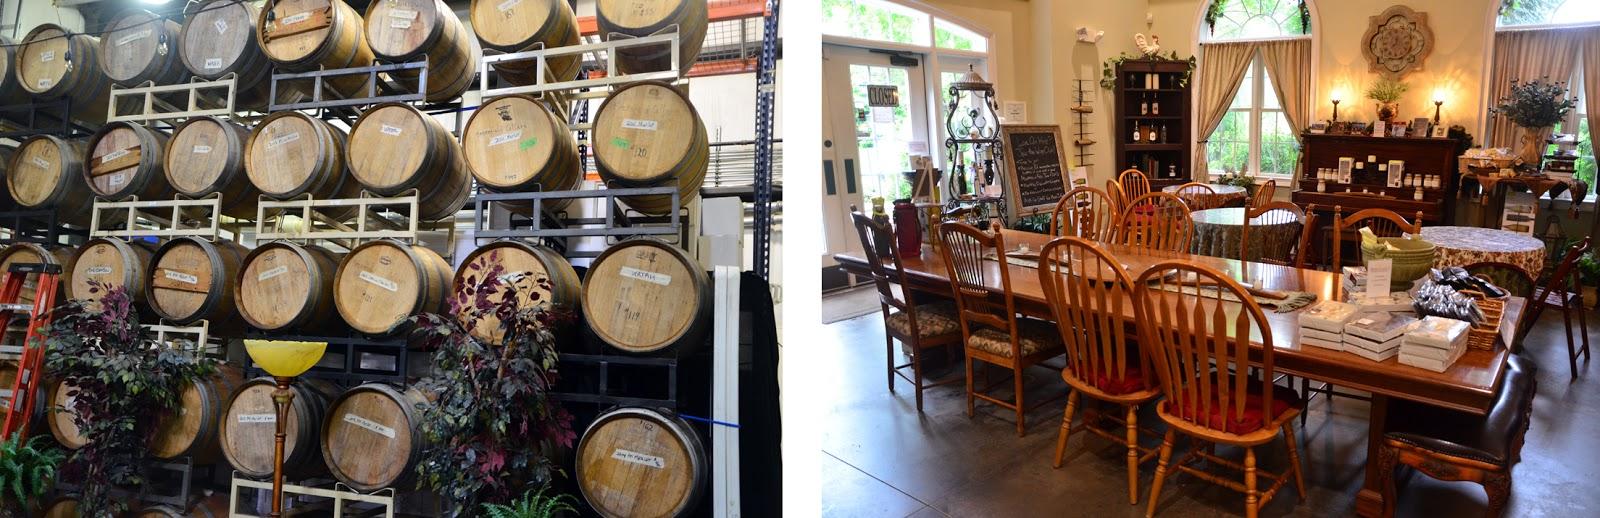 Stonefield Cellars NC Wine-3.jpg